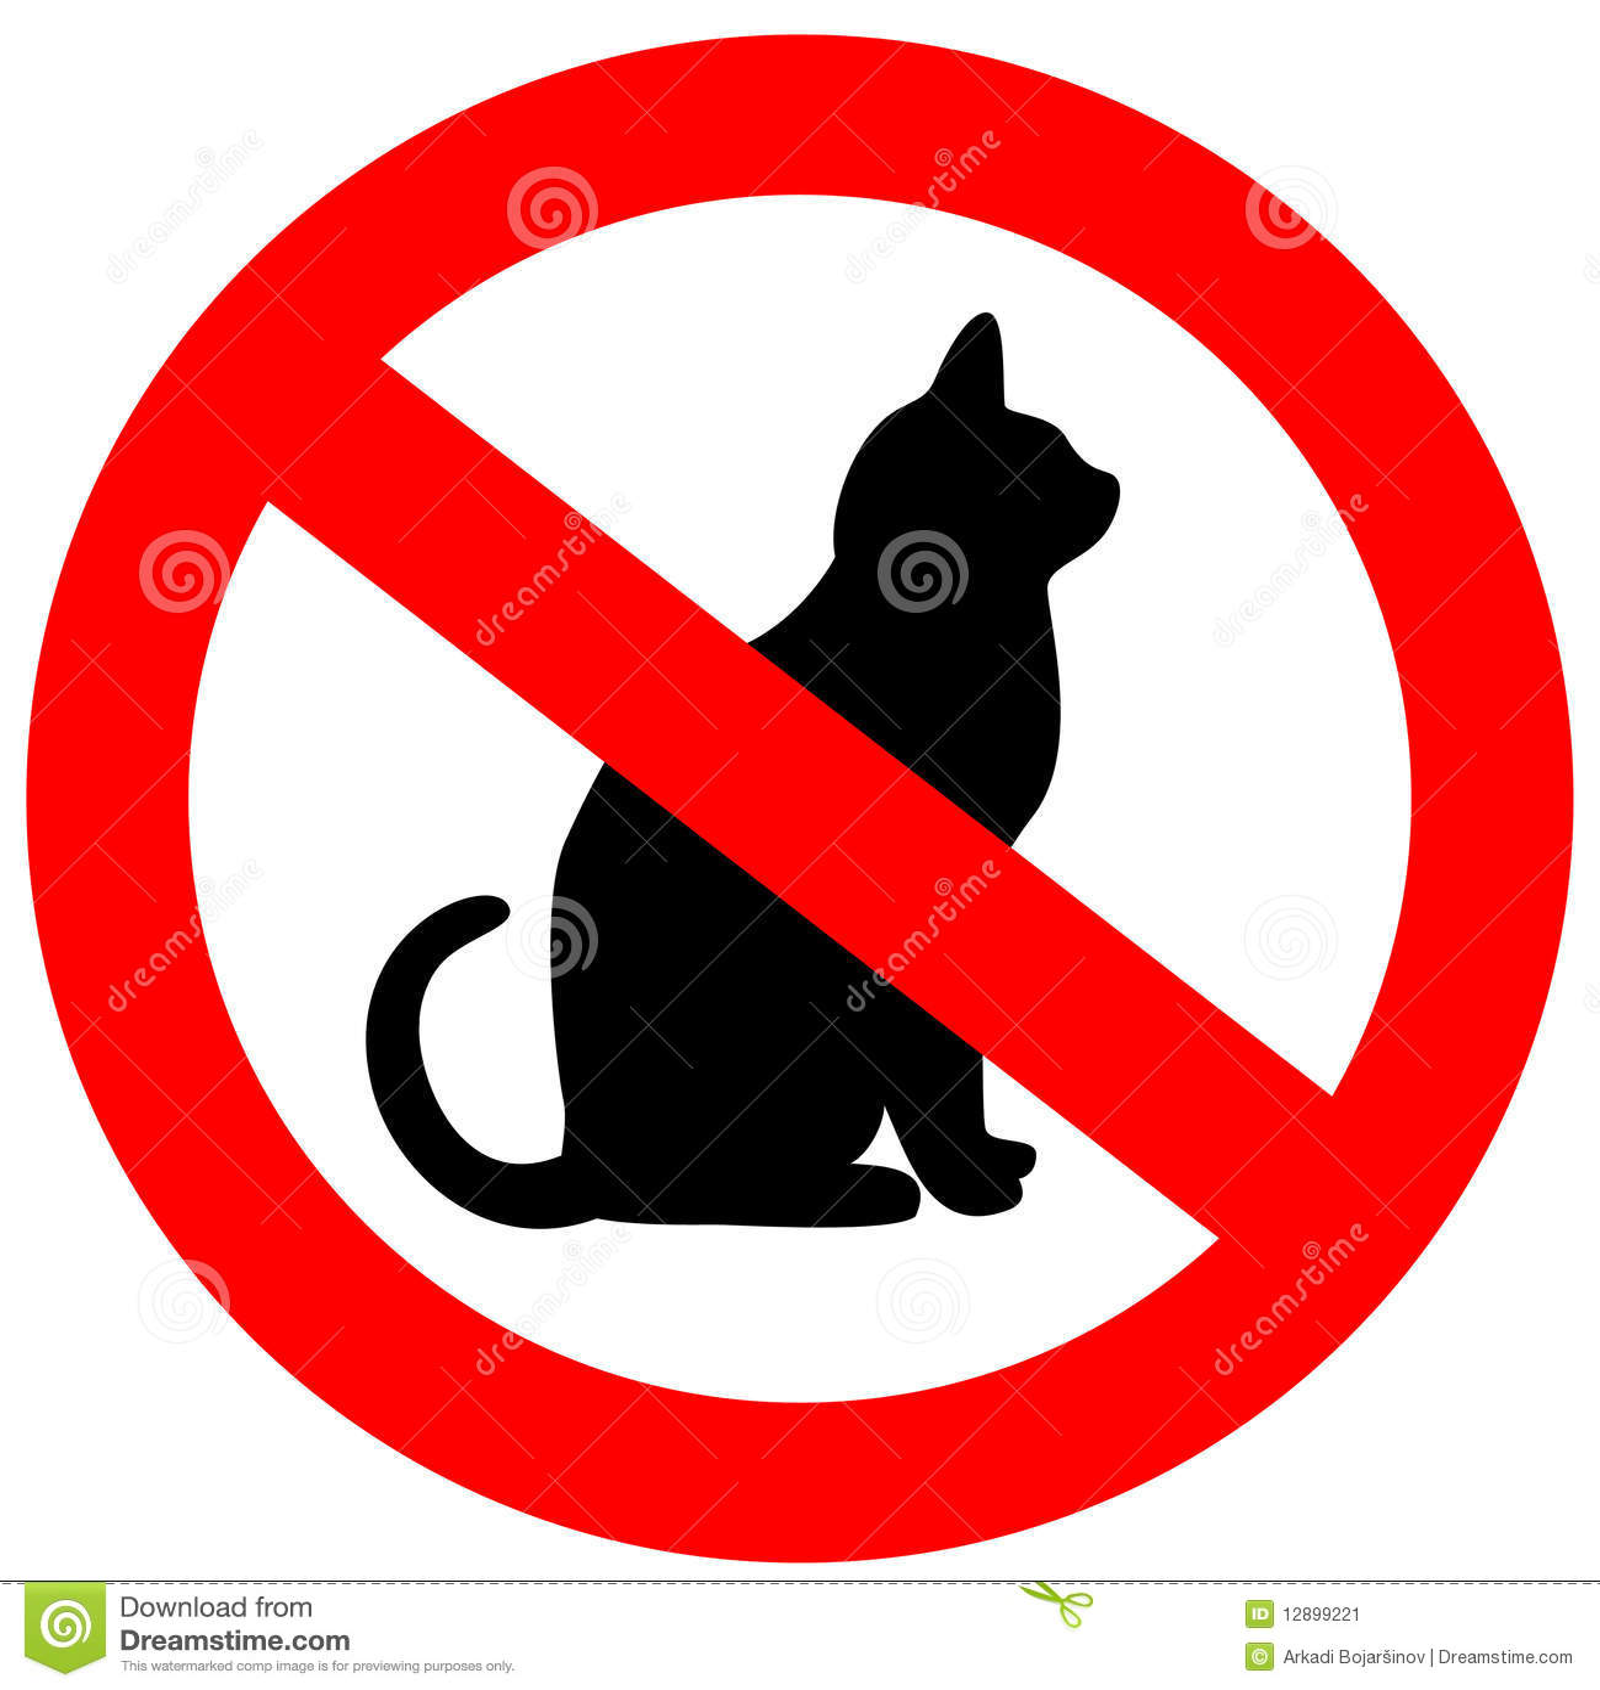 No Cats Stock Image - Image: 12899221